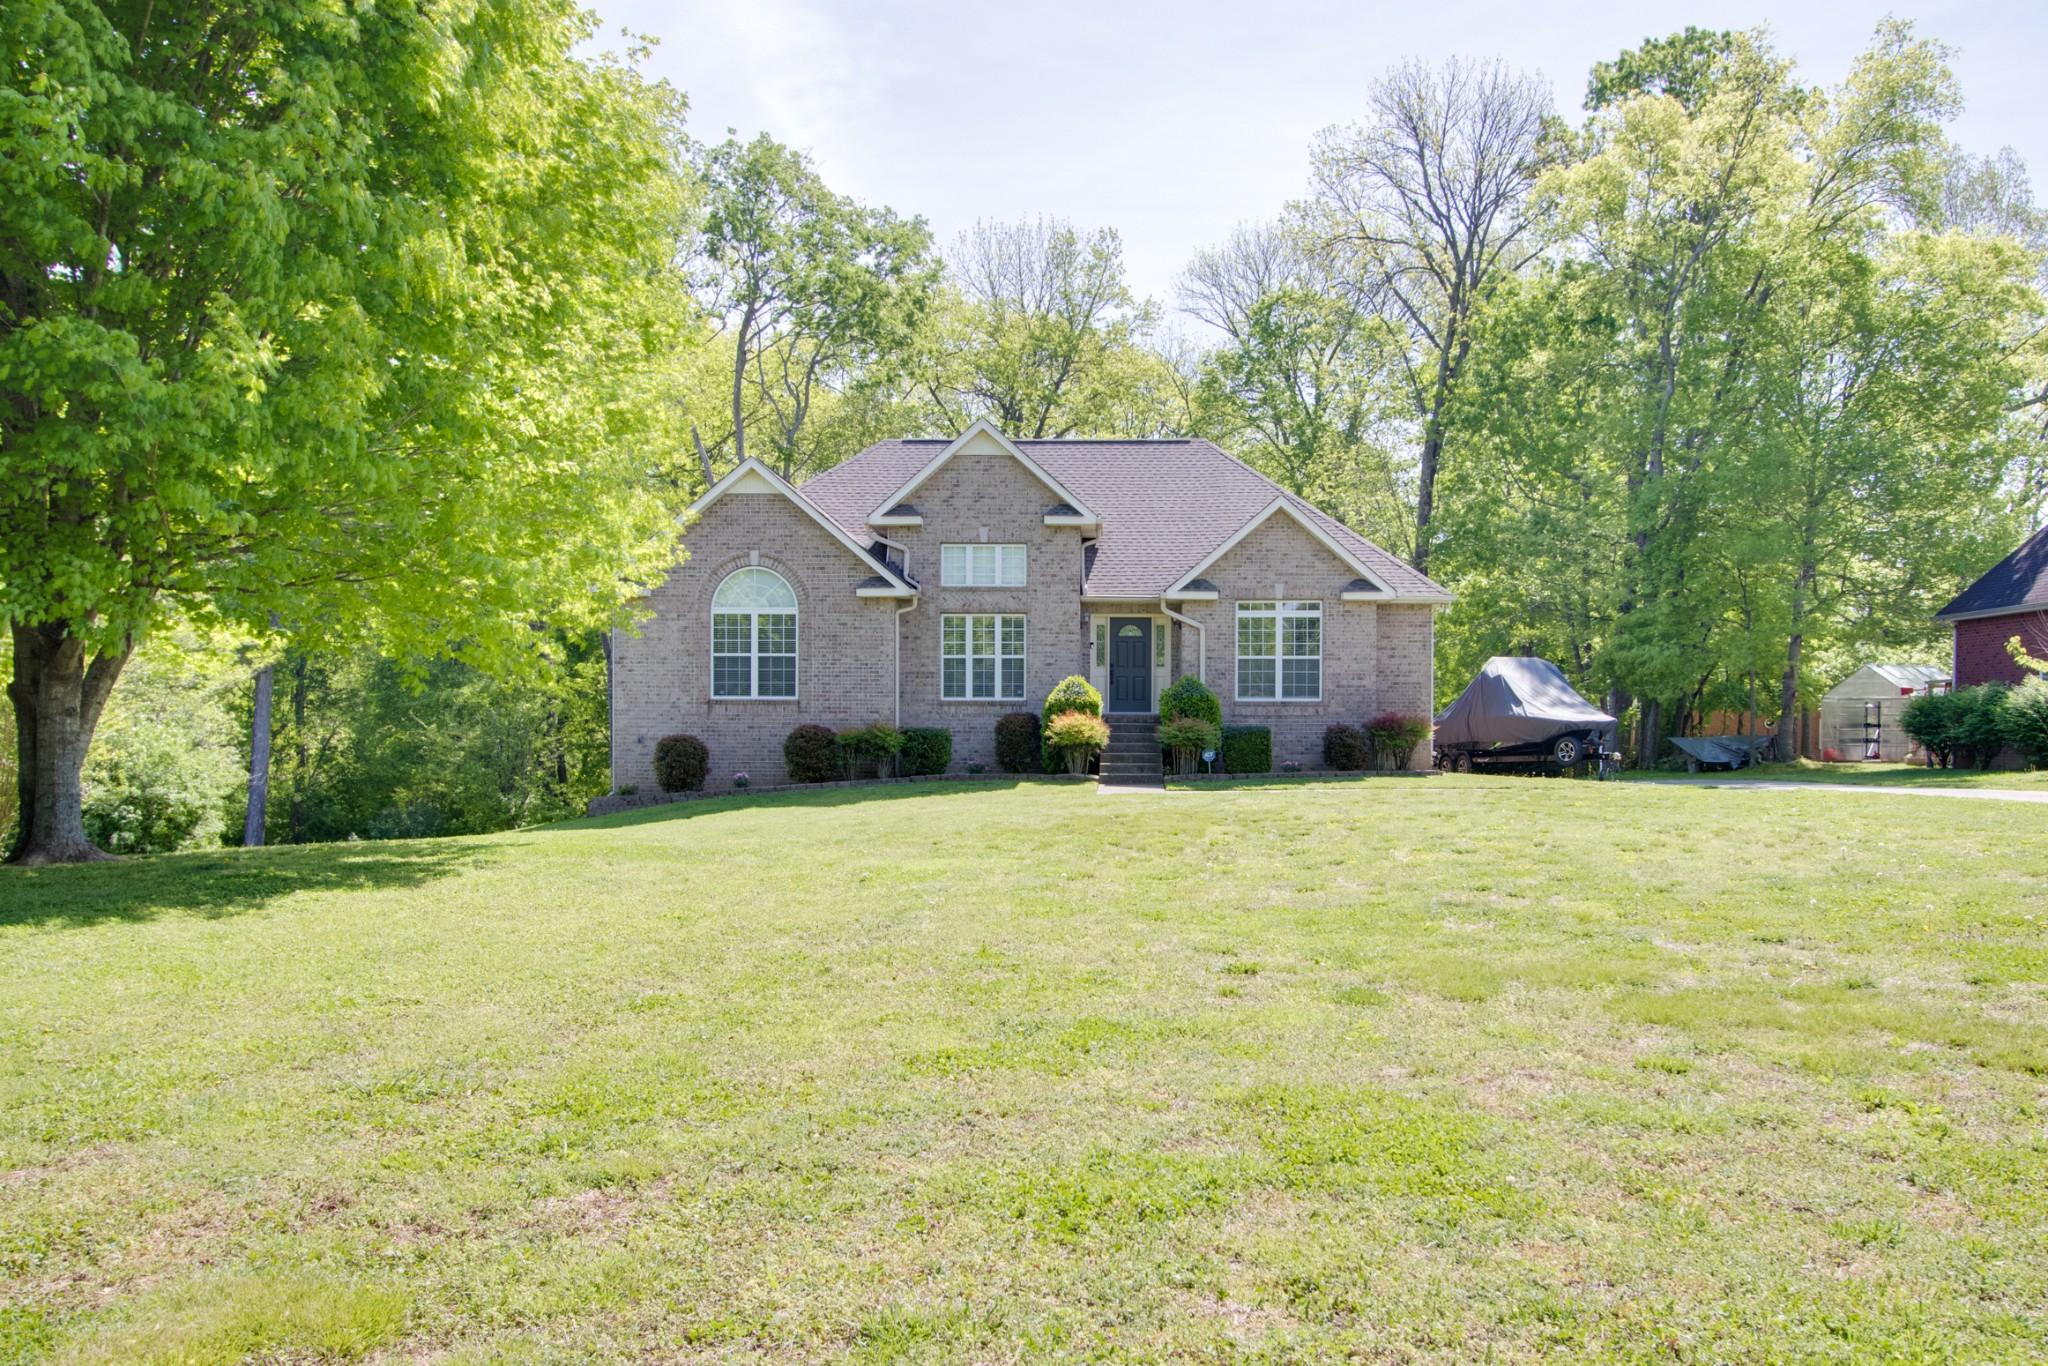 2026 Chesapeake Way Property Photo - Mount Juliet, TN real estate listing